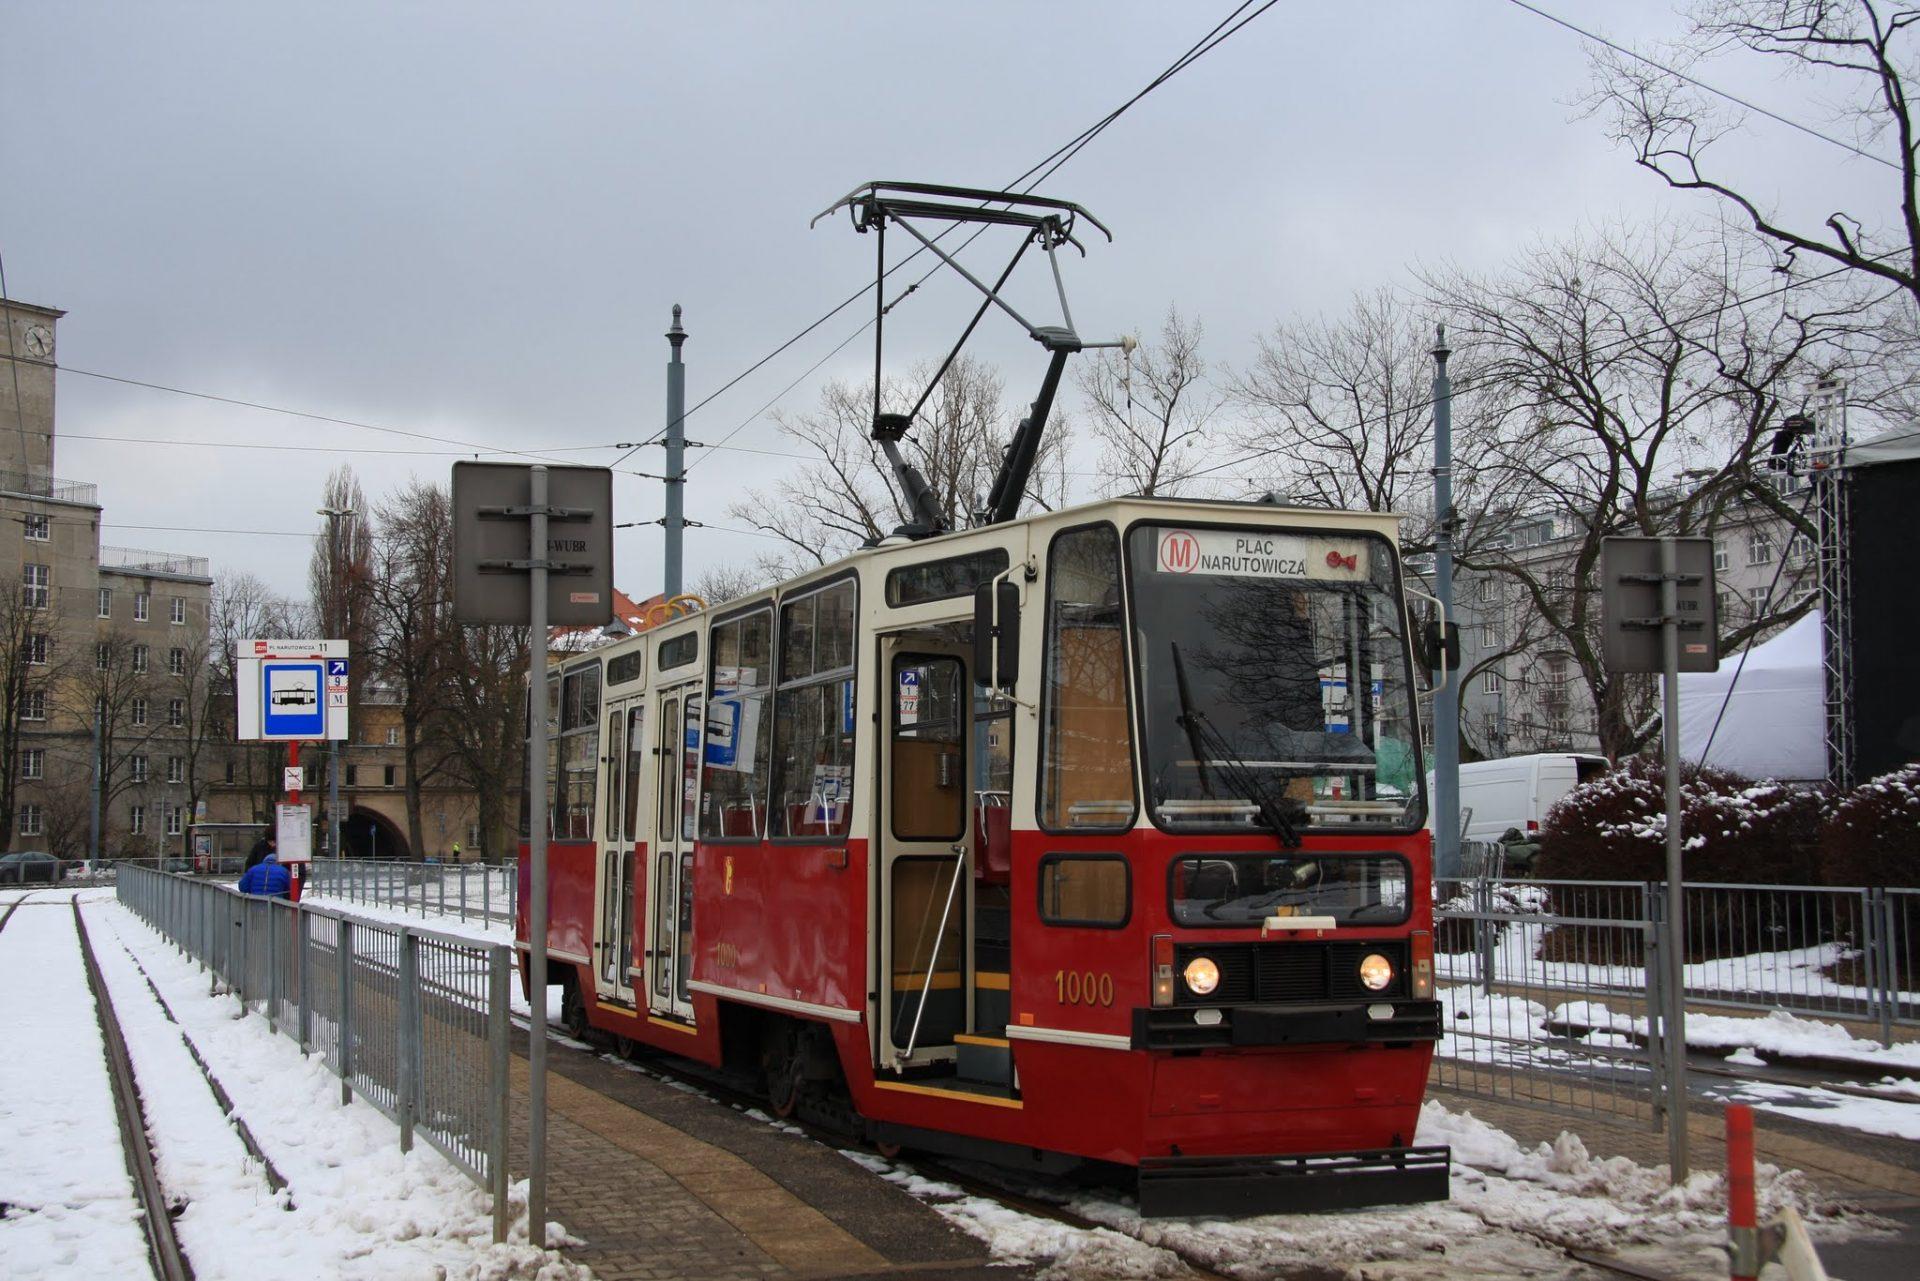 105N_1000_Pl.Narutowicza_zima